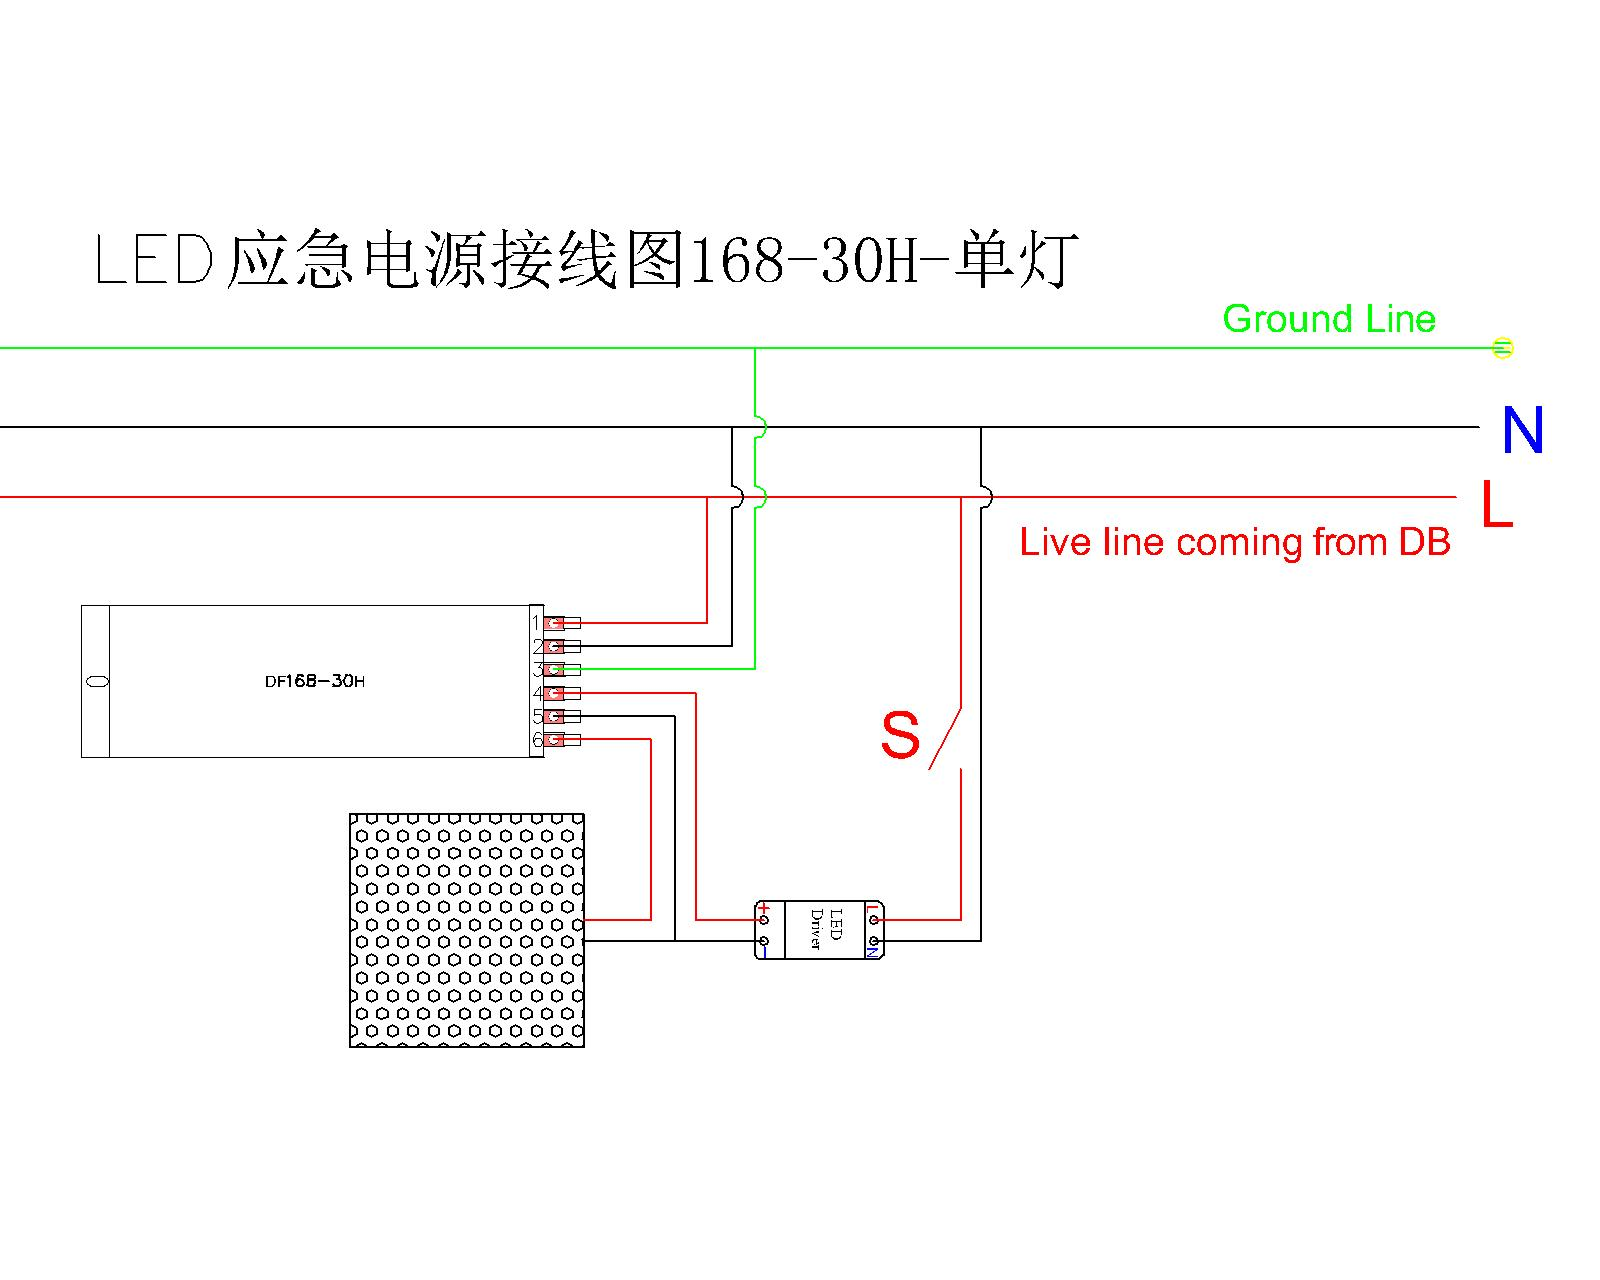 led应急电源接线图方法 led应急电源接线图-168-30h整体-单灯